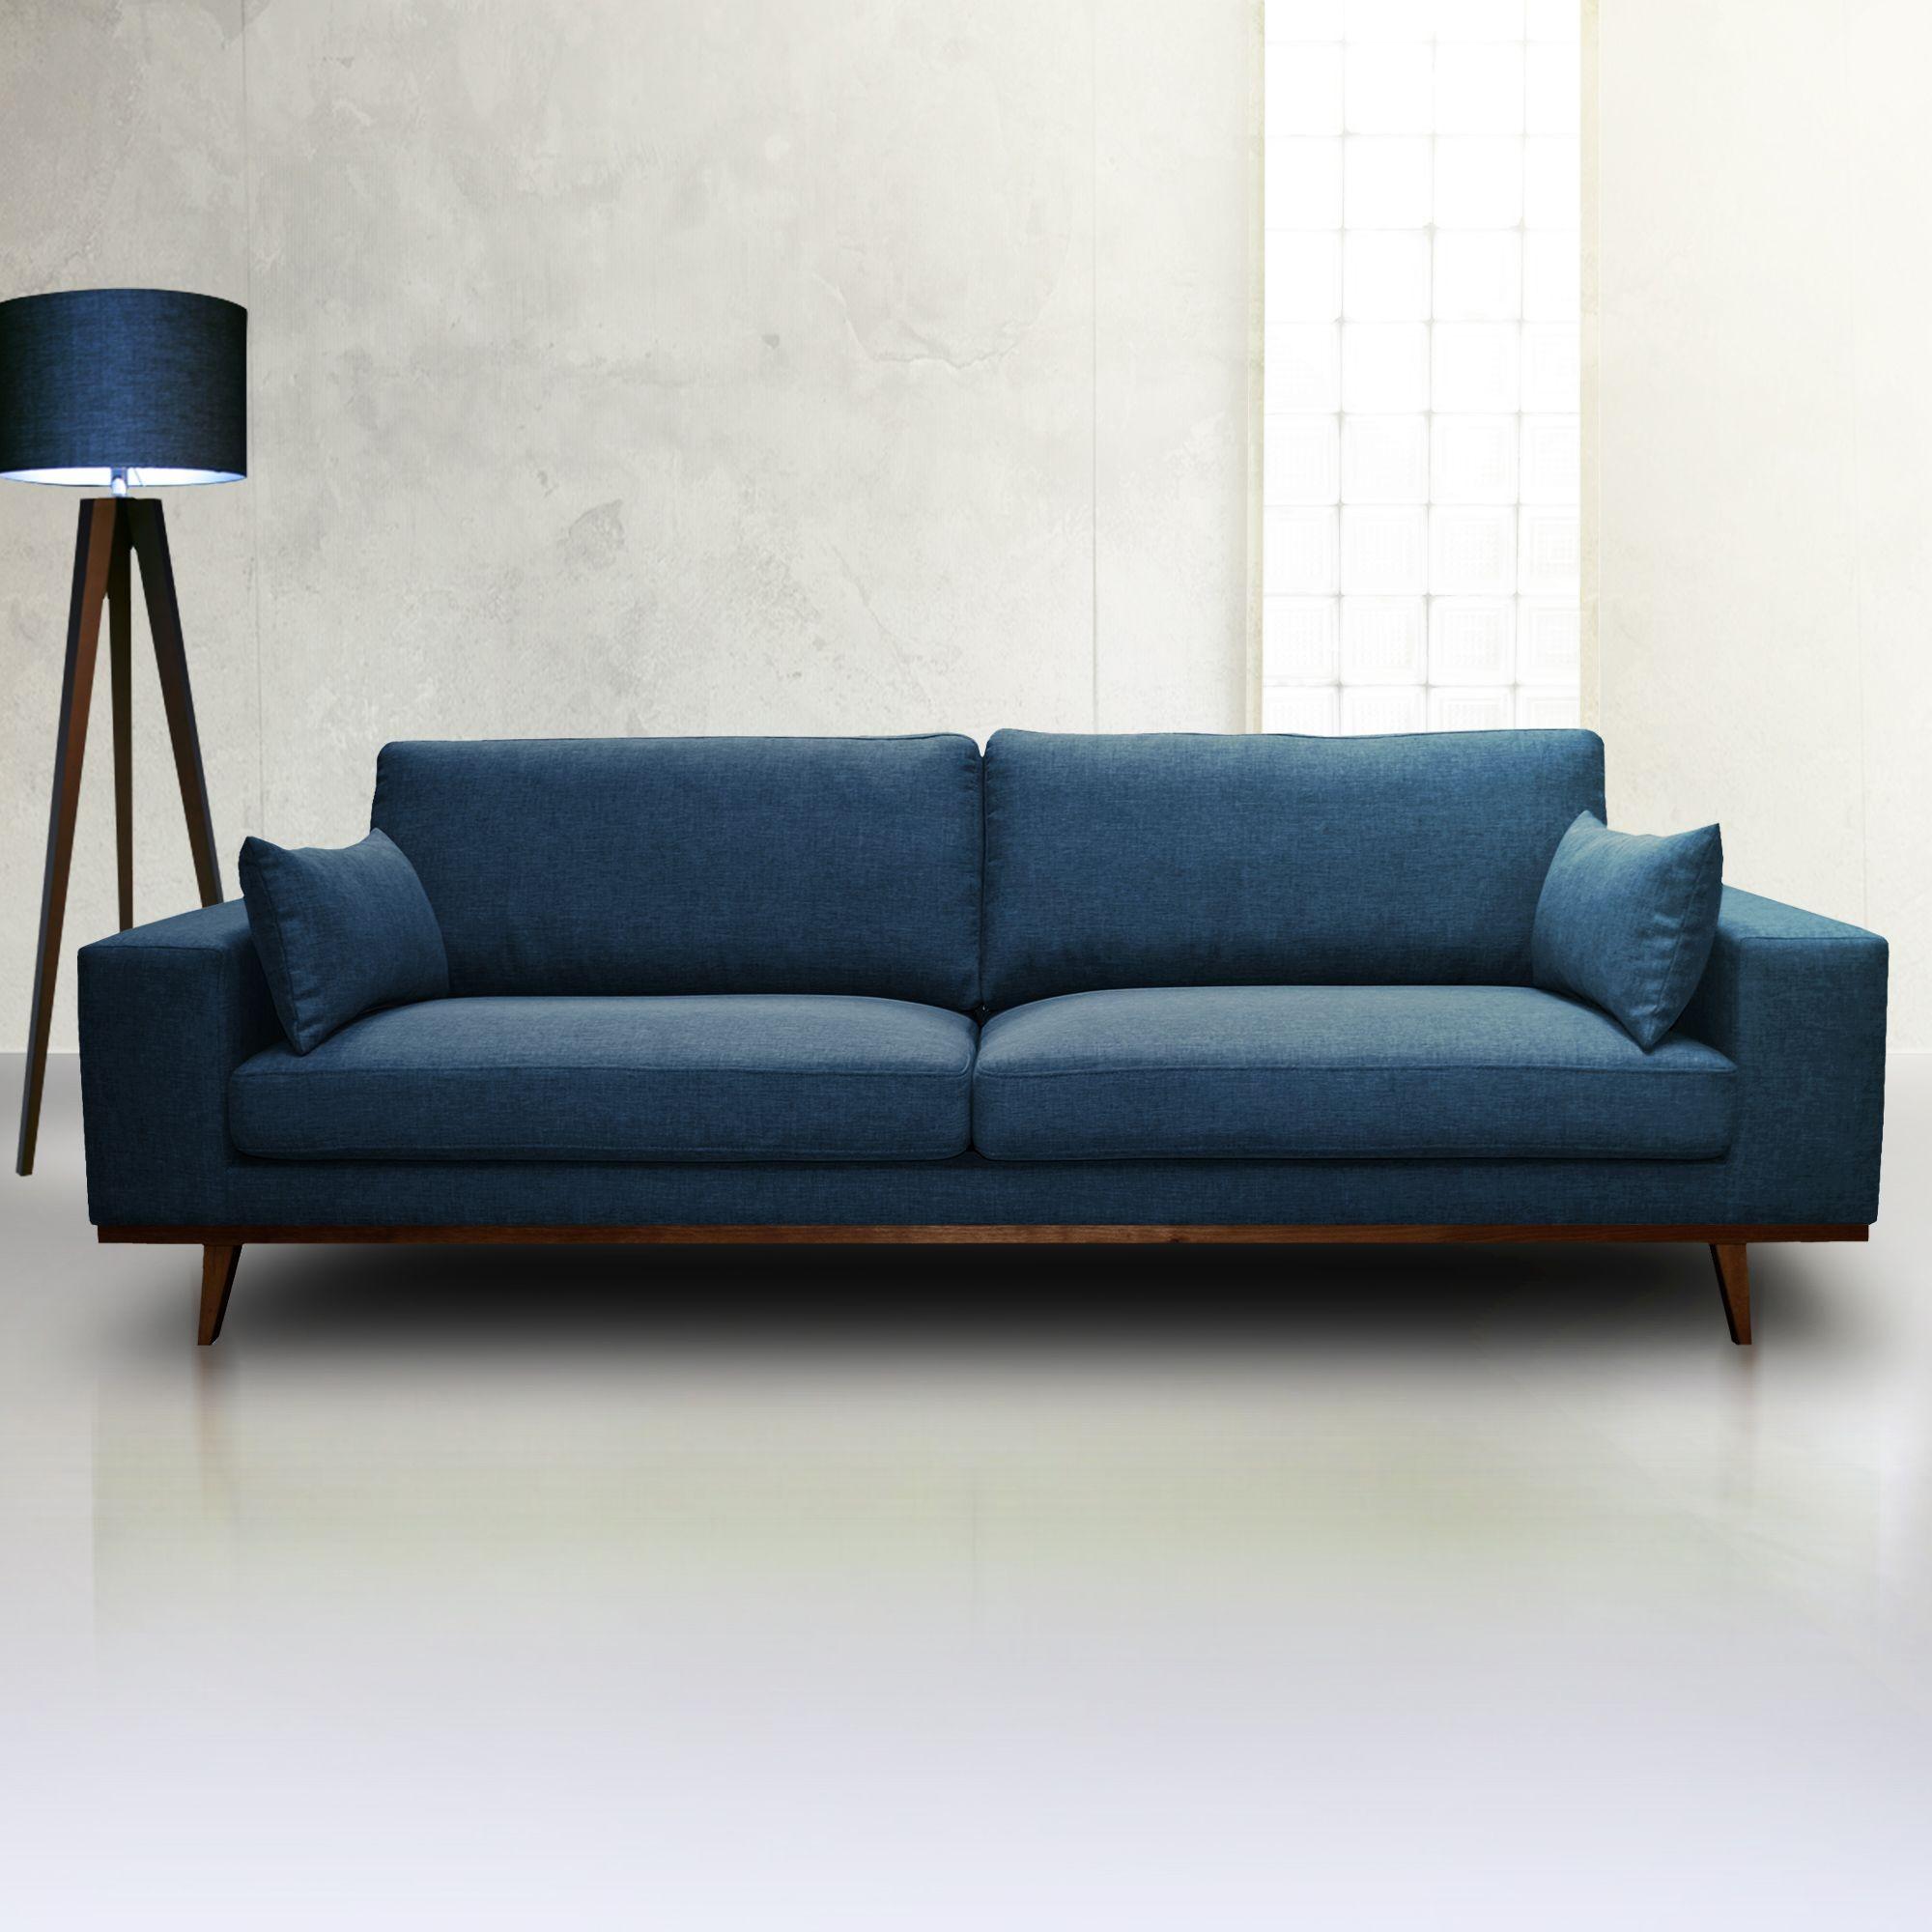 Ikea Canape Angle Convertible Inspirant Galerie Lit Armoire Canapé Beautiful Canap En U Convertible 12 Full Canape D